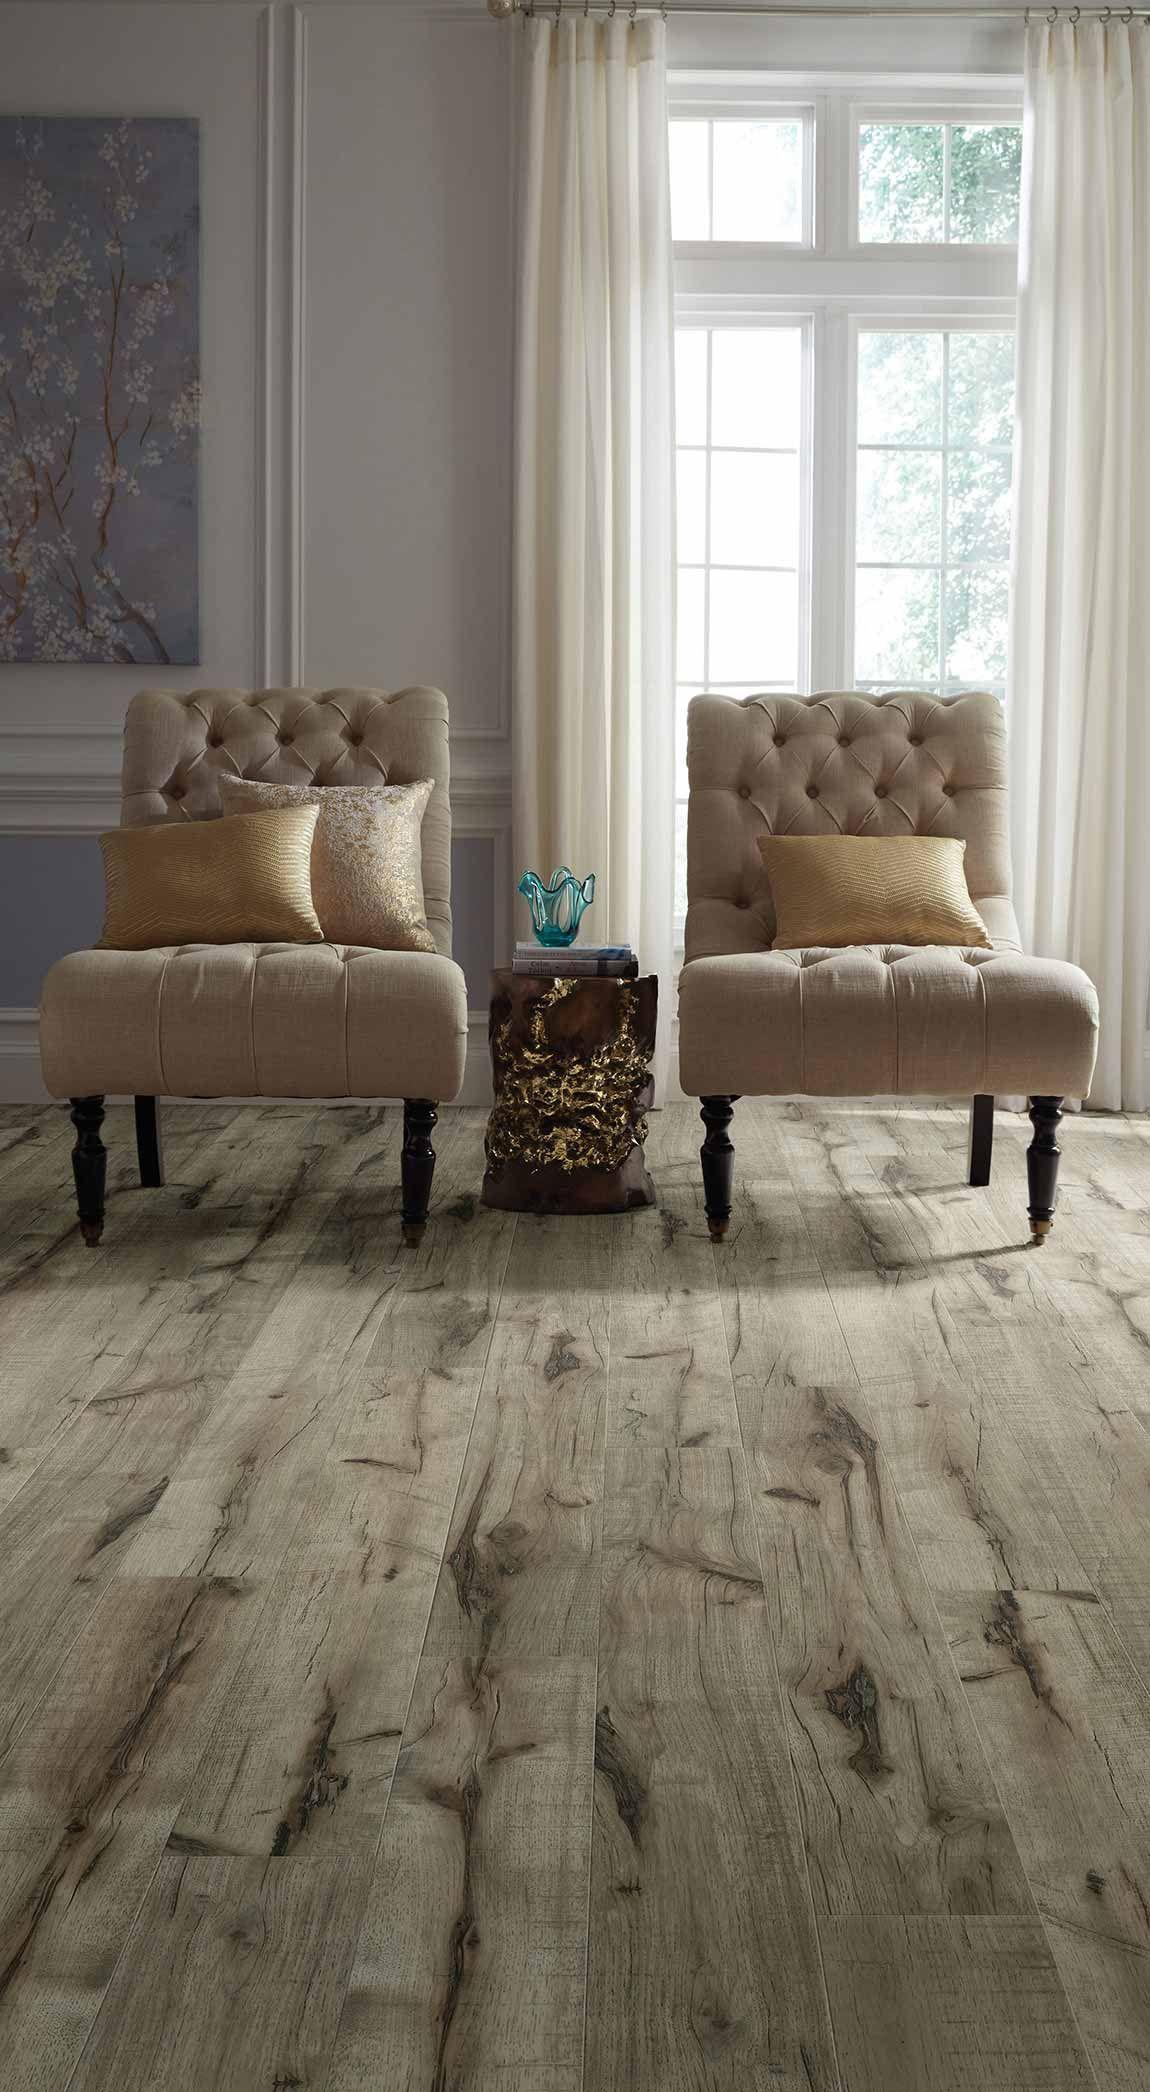 Virtual Design Living Room: Living Room-Modern Contemporary-Wood Look-Medium